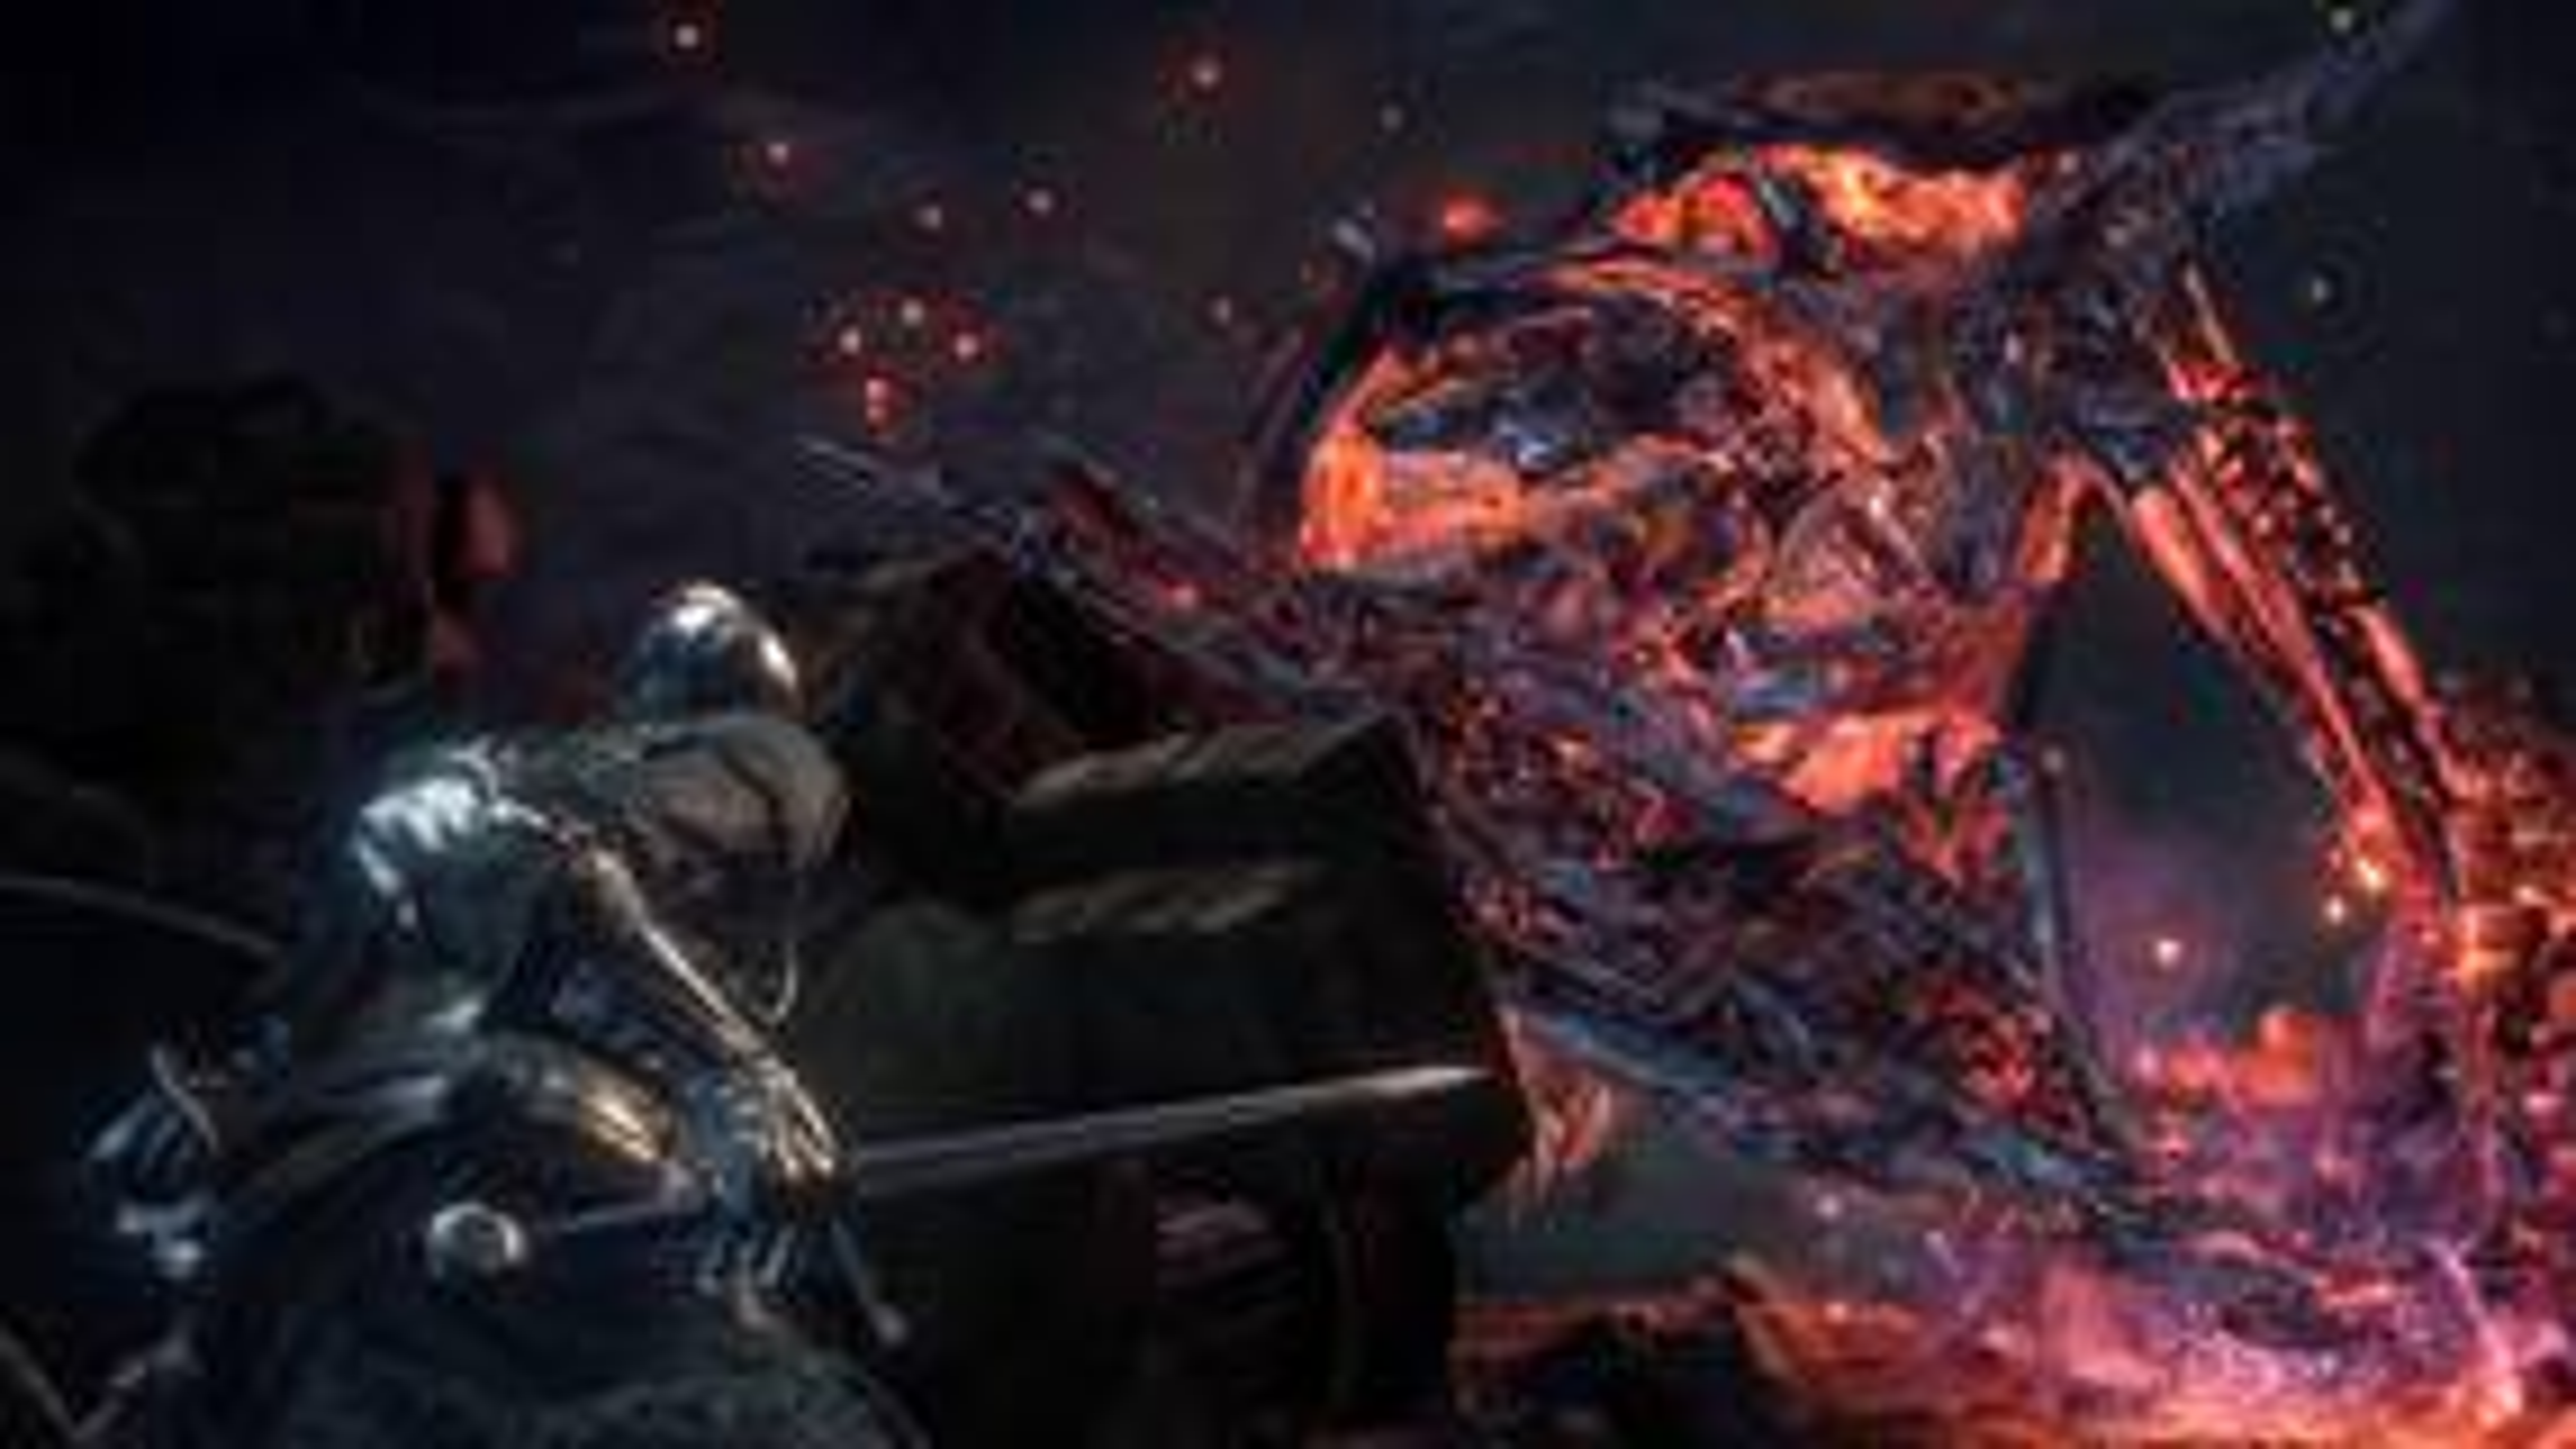 Image for Dark Souls 3: The Ringed City walkthrough - The Demon Prince boss battle